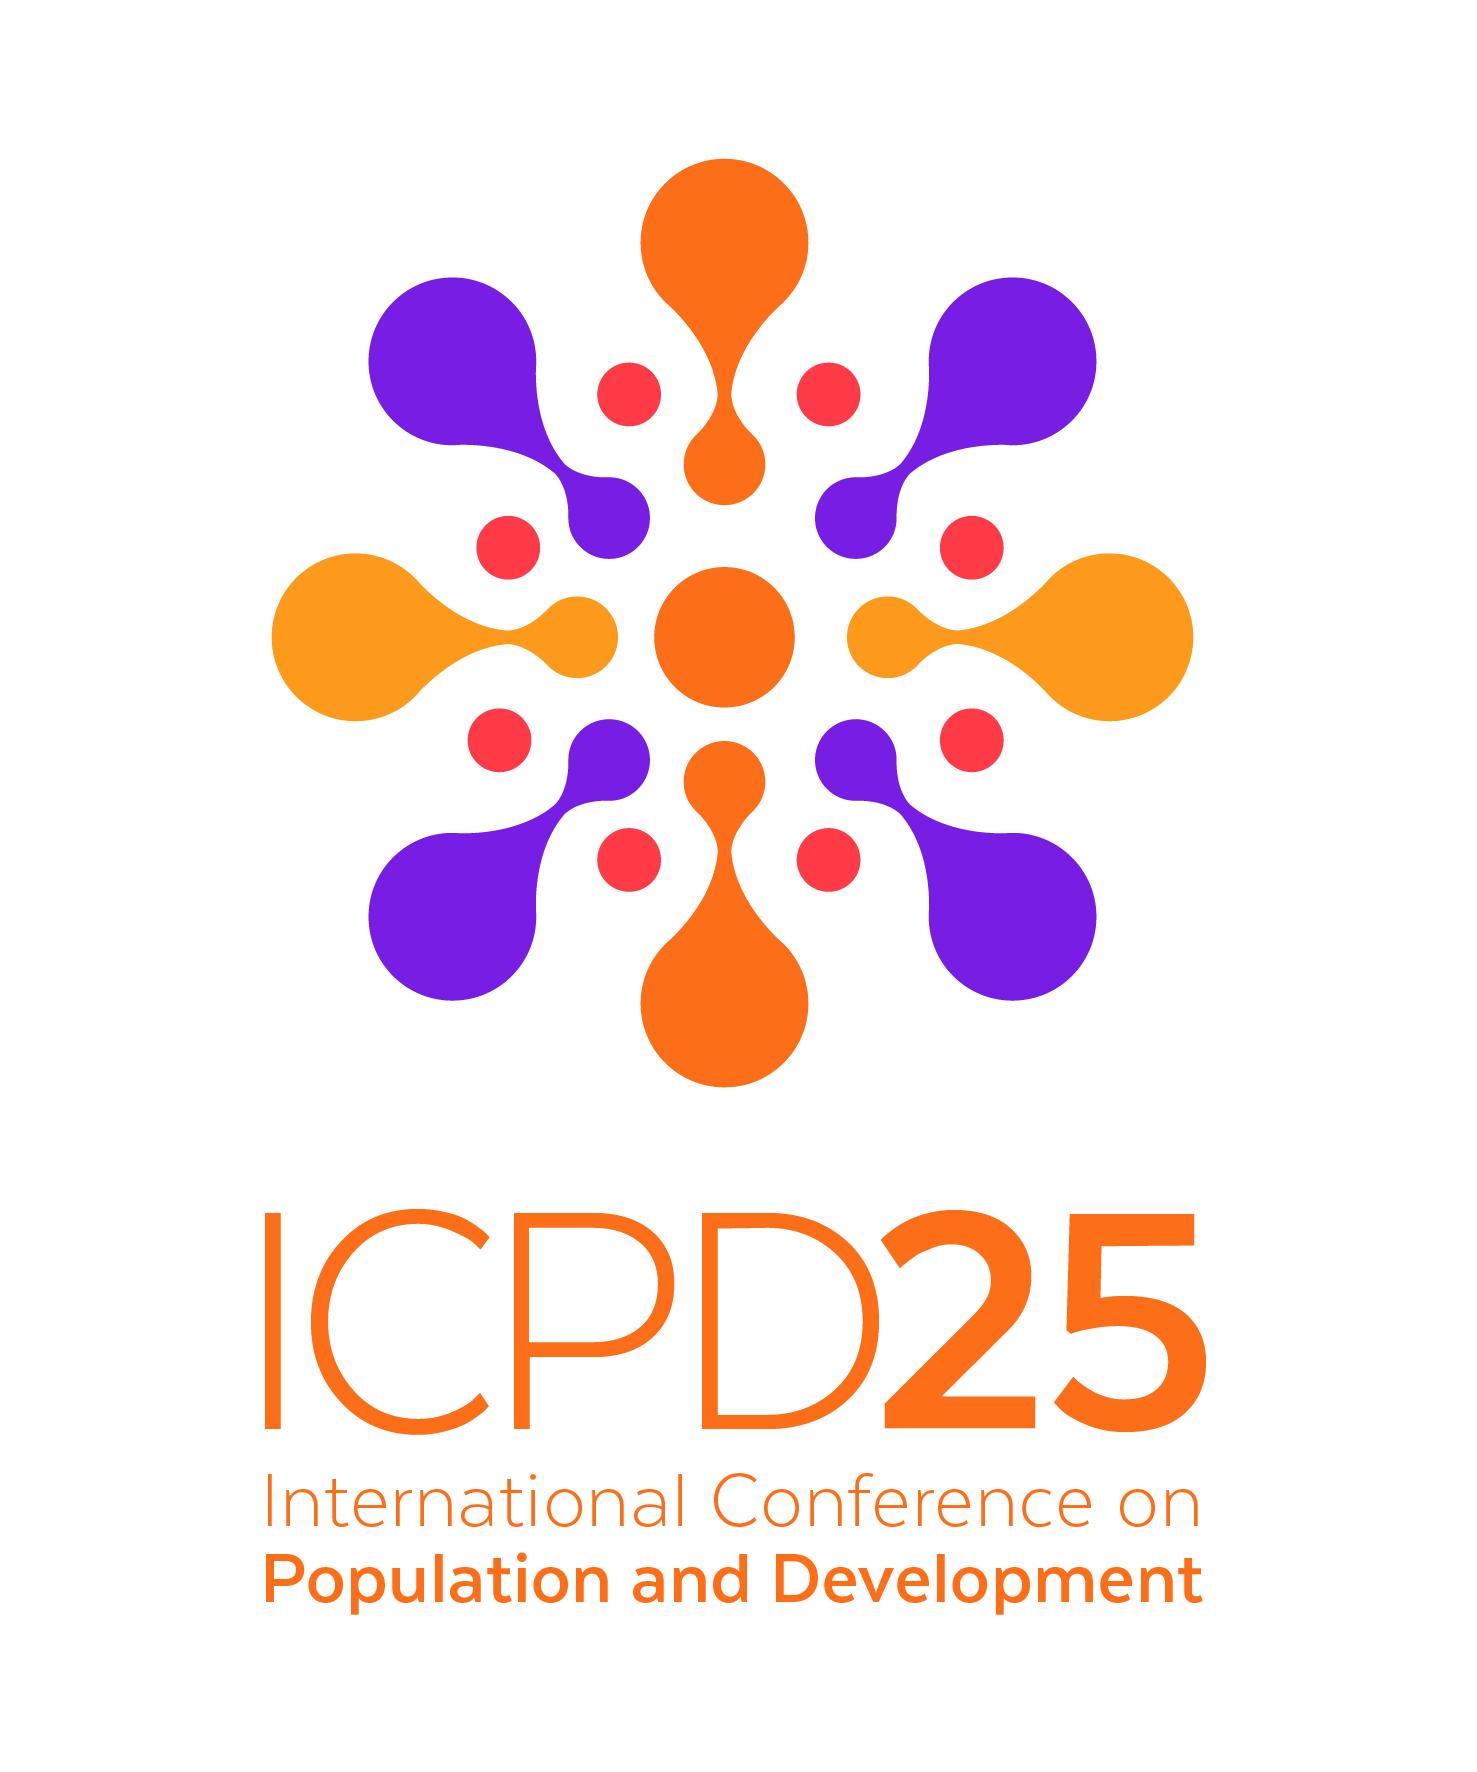 ICPD logo